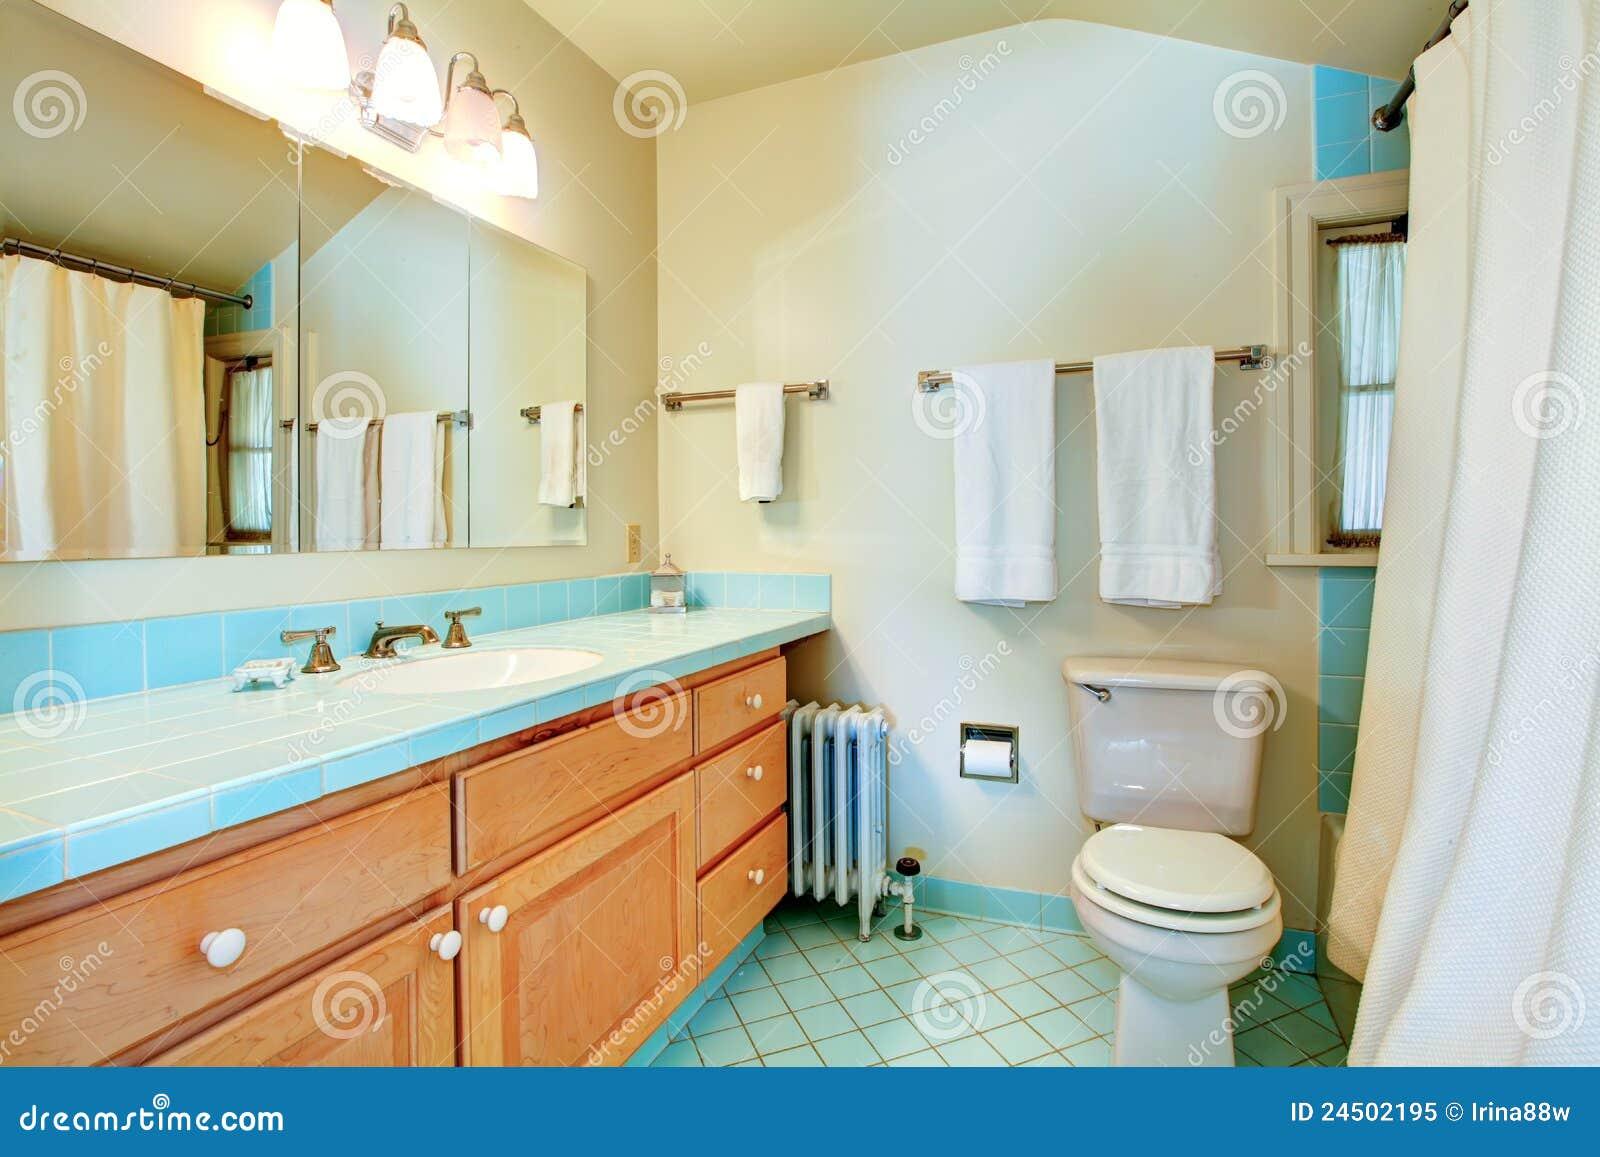 Oude antieke badkamers met blauwe tegels royalty vrije stock foto afbeelding 24502195 - Oude badkamer ...